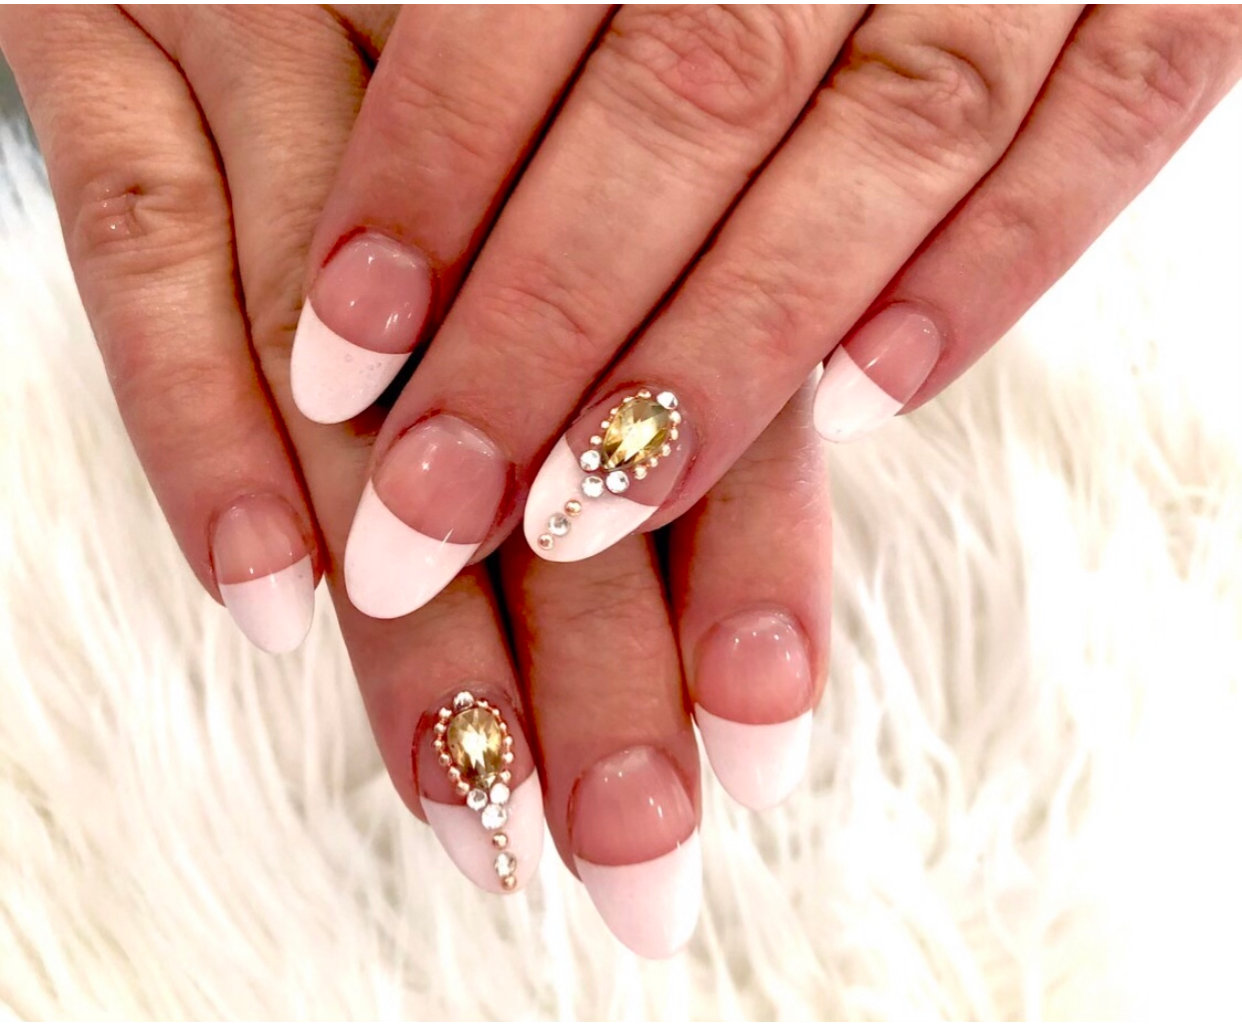 Pink & White Gel Fill